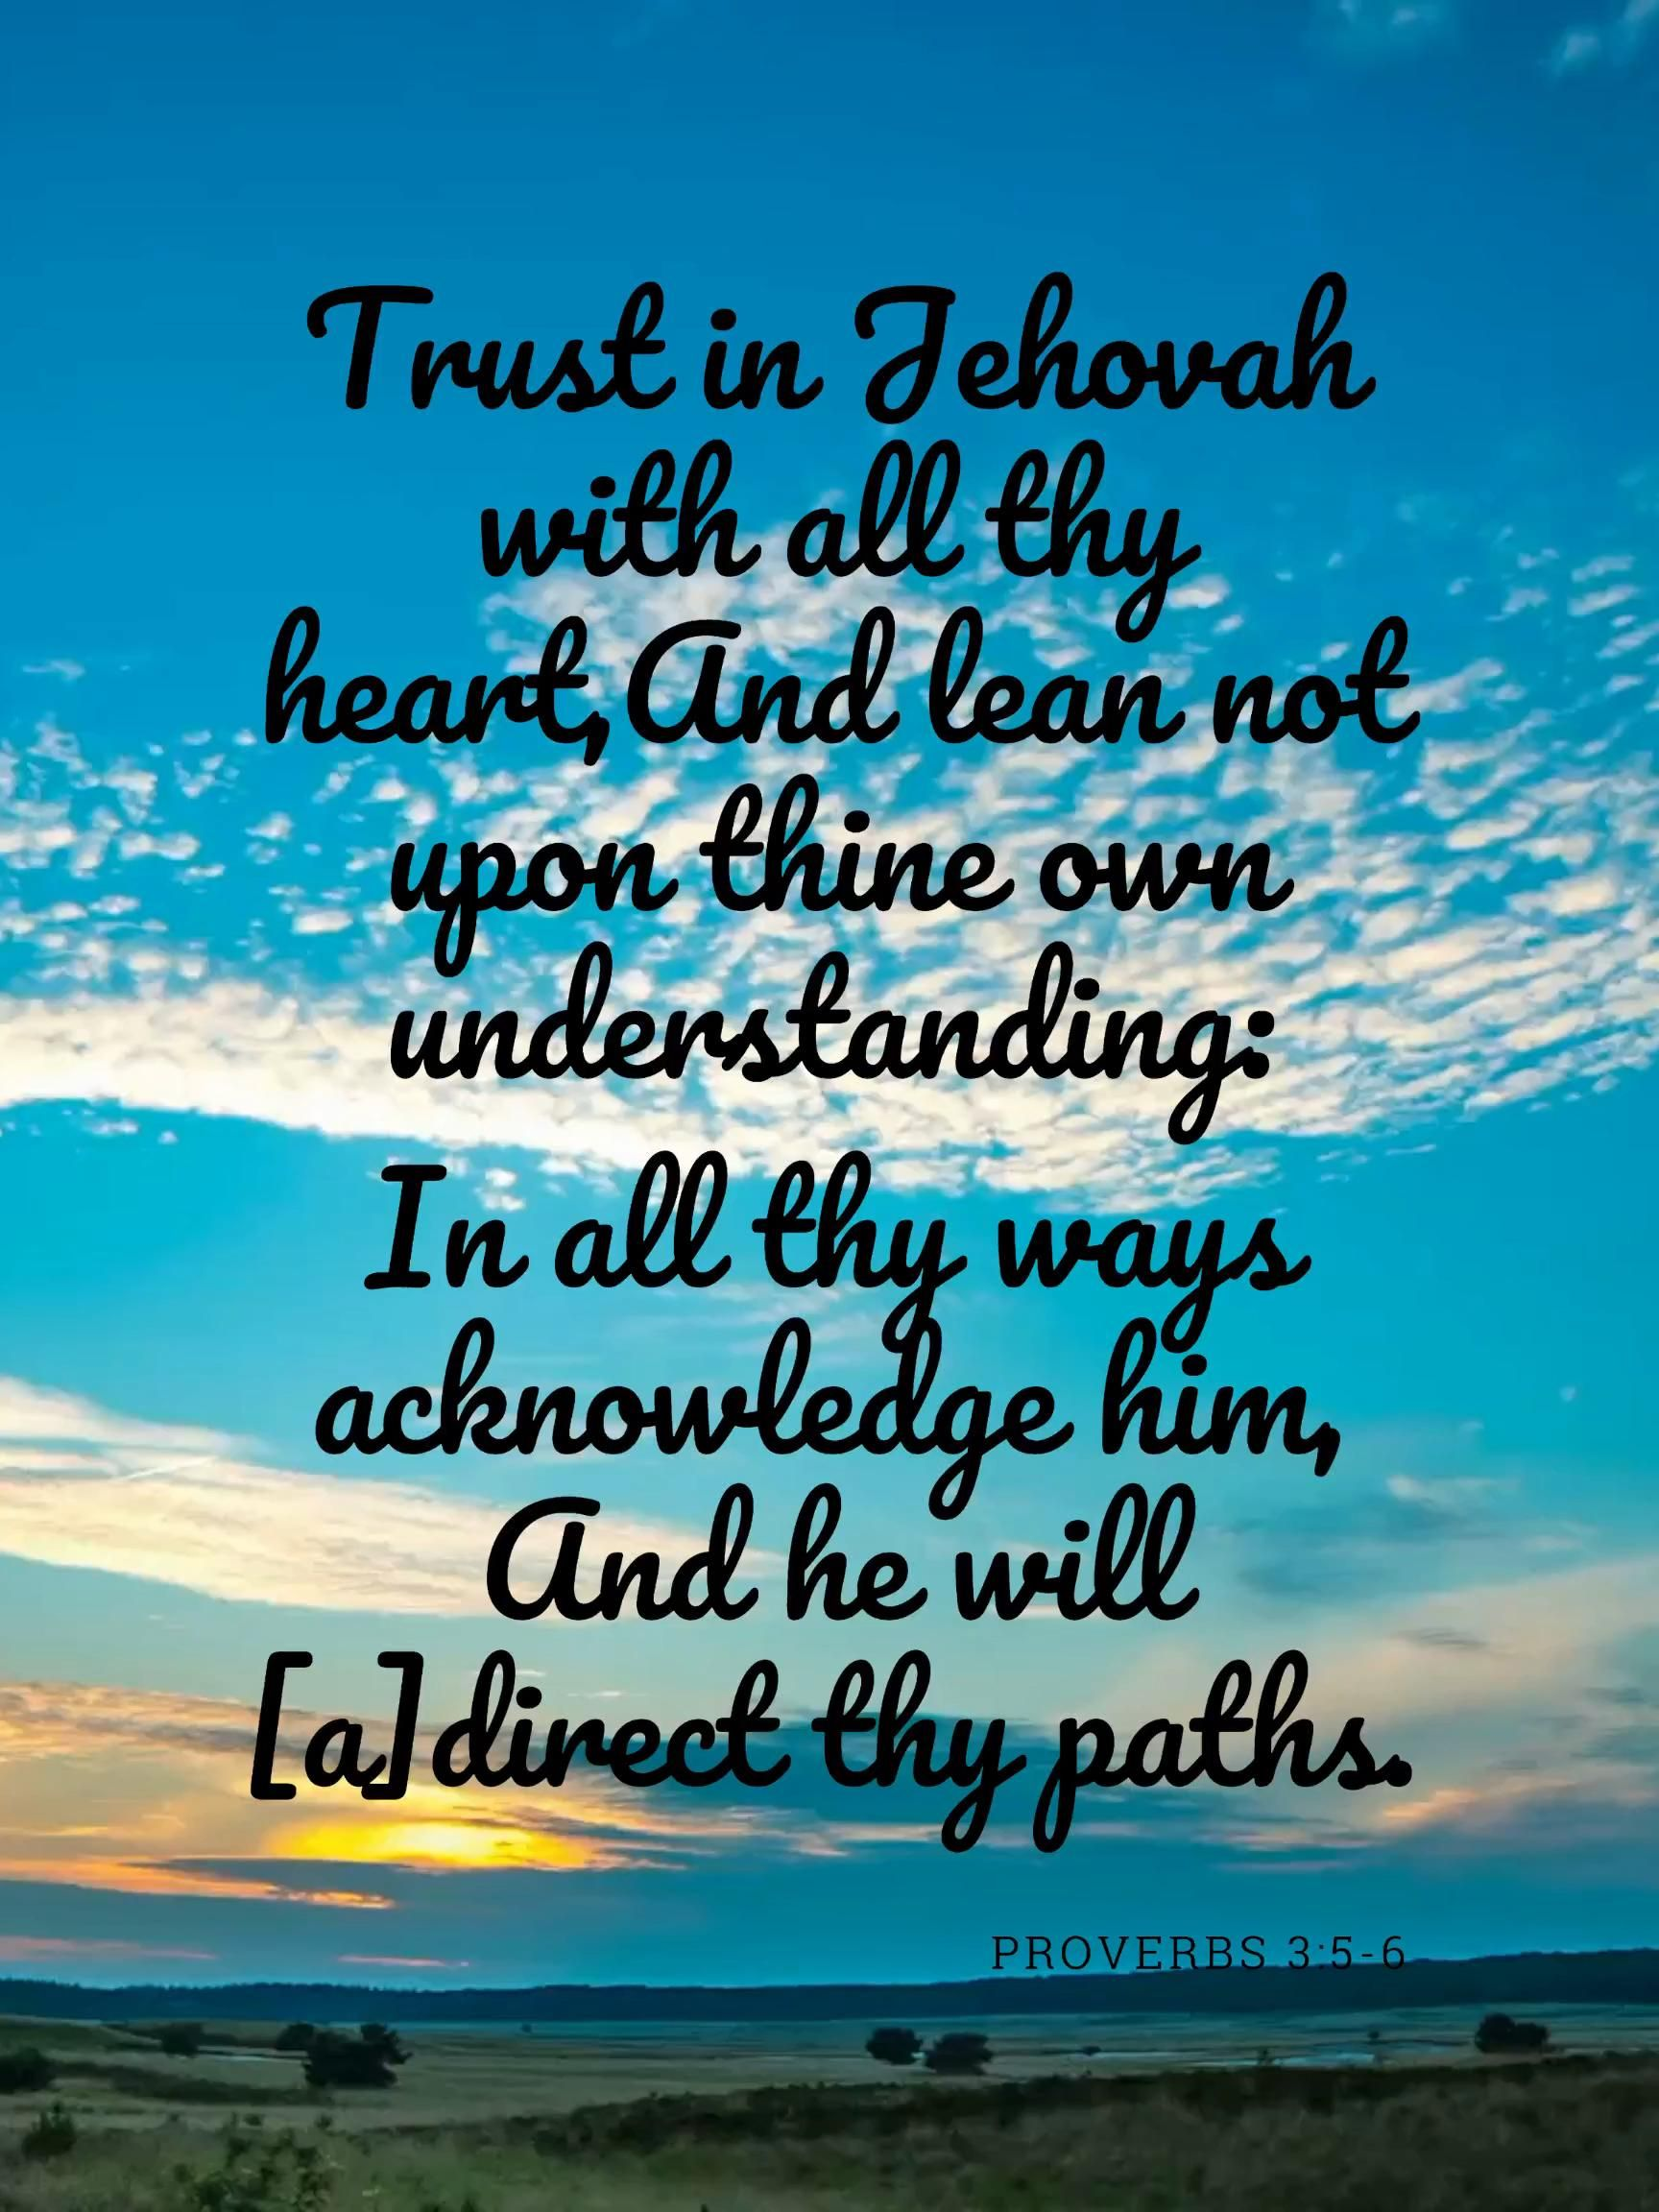 Proverbs 3:5-6, Scripture